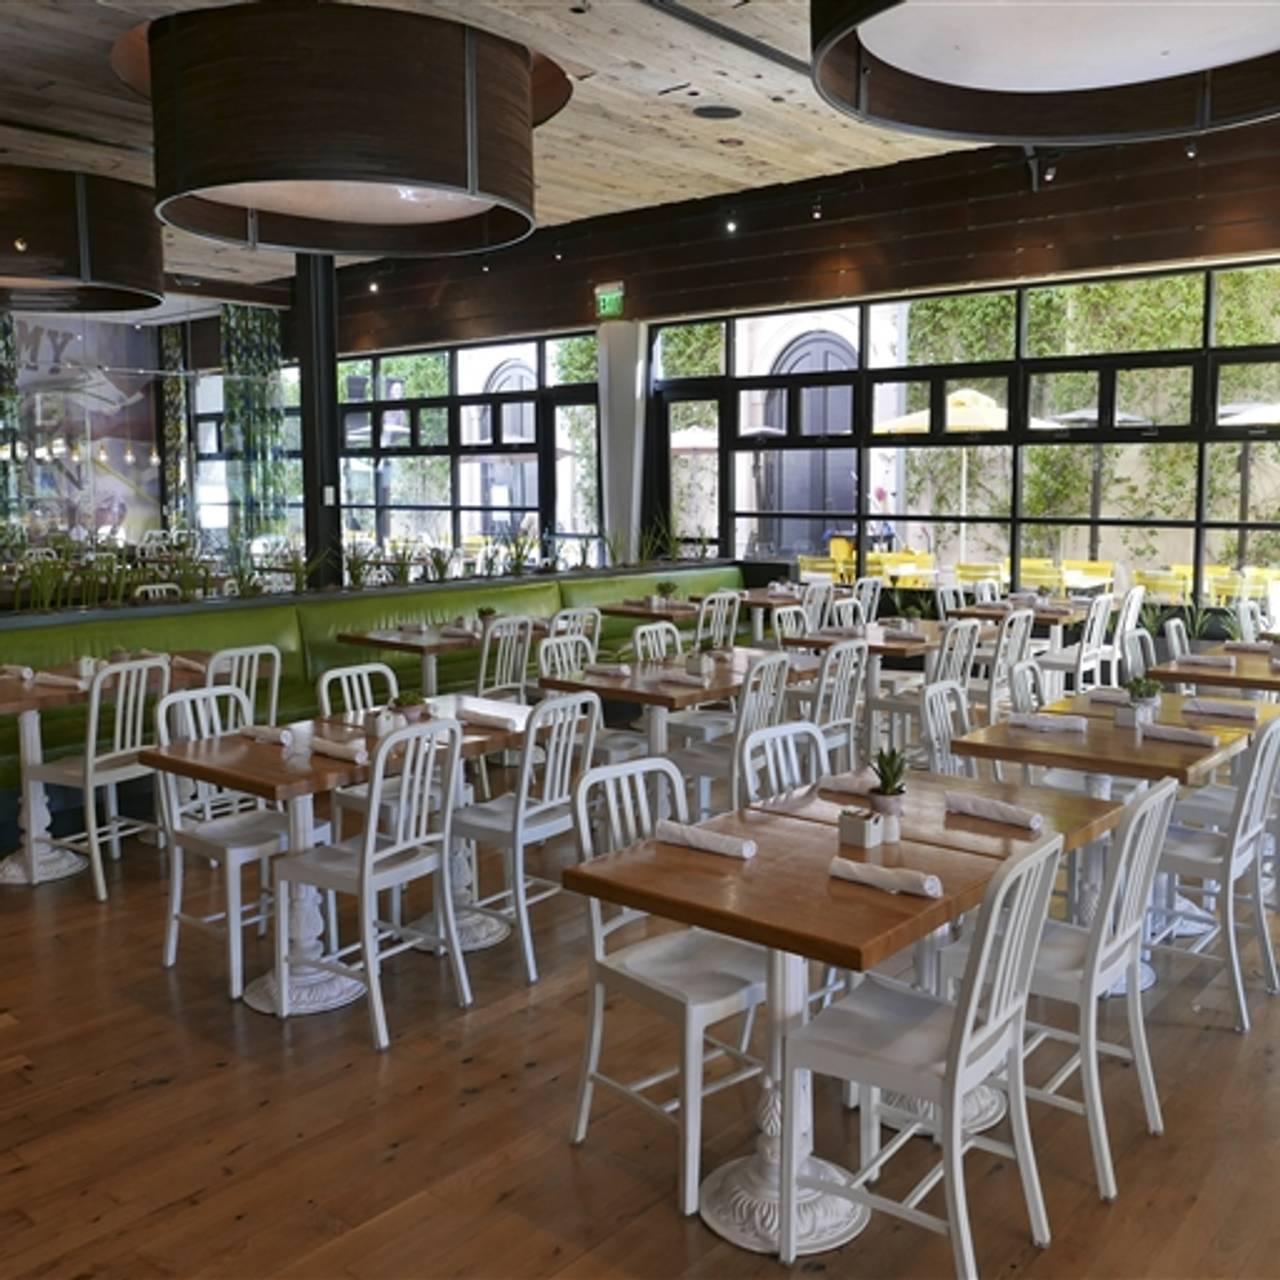 True Food Kitchen - Biltmore Restaurant - Phoenix, AZ | OpenTable